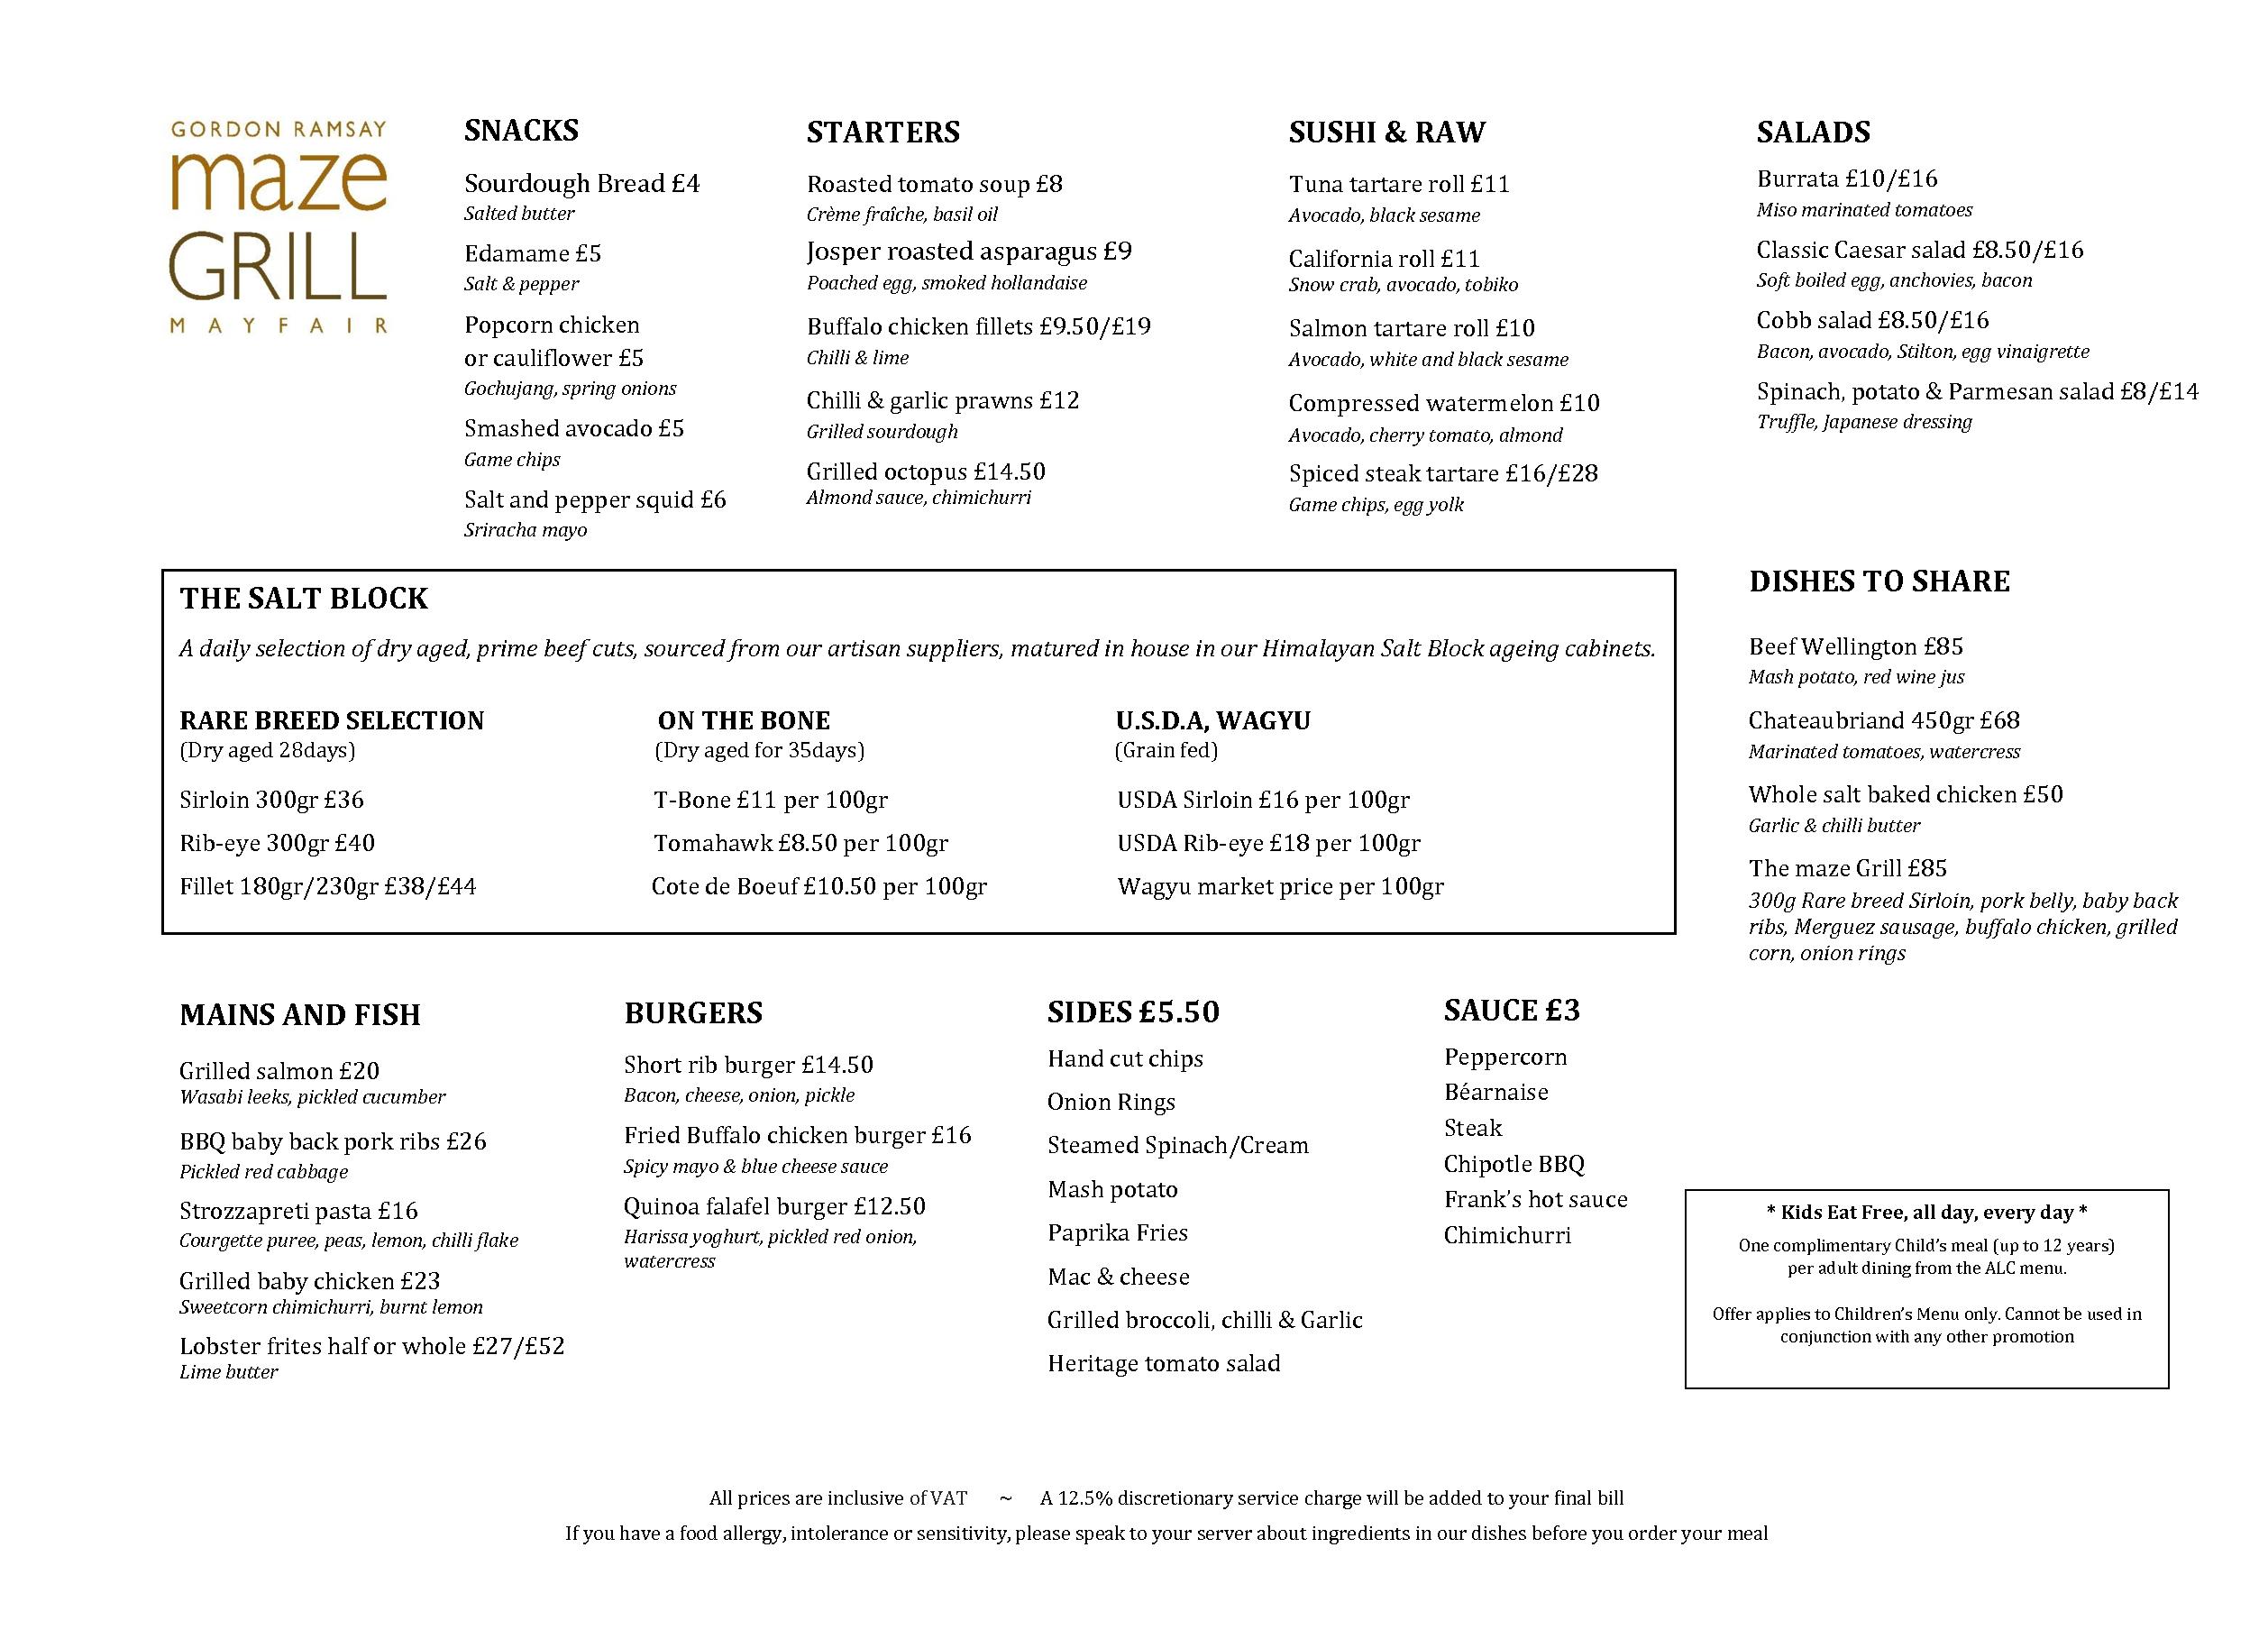 View our Menus - maze Grill Mayfair | Gordon Ramsay Restaurants